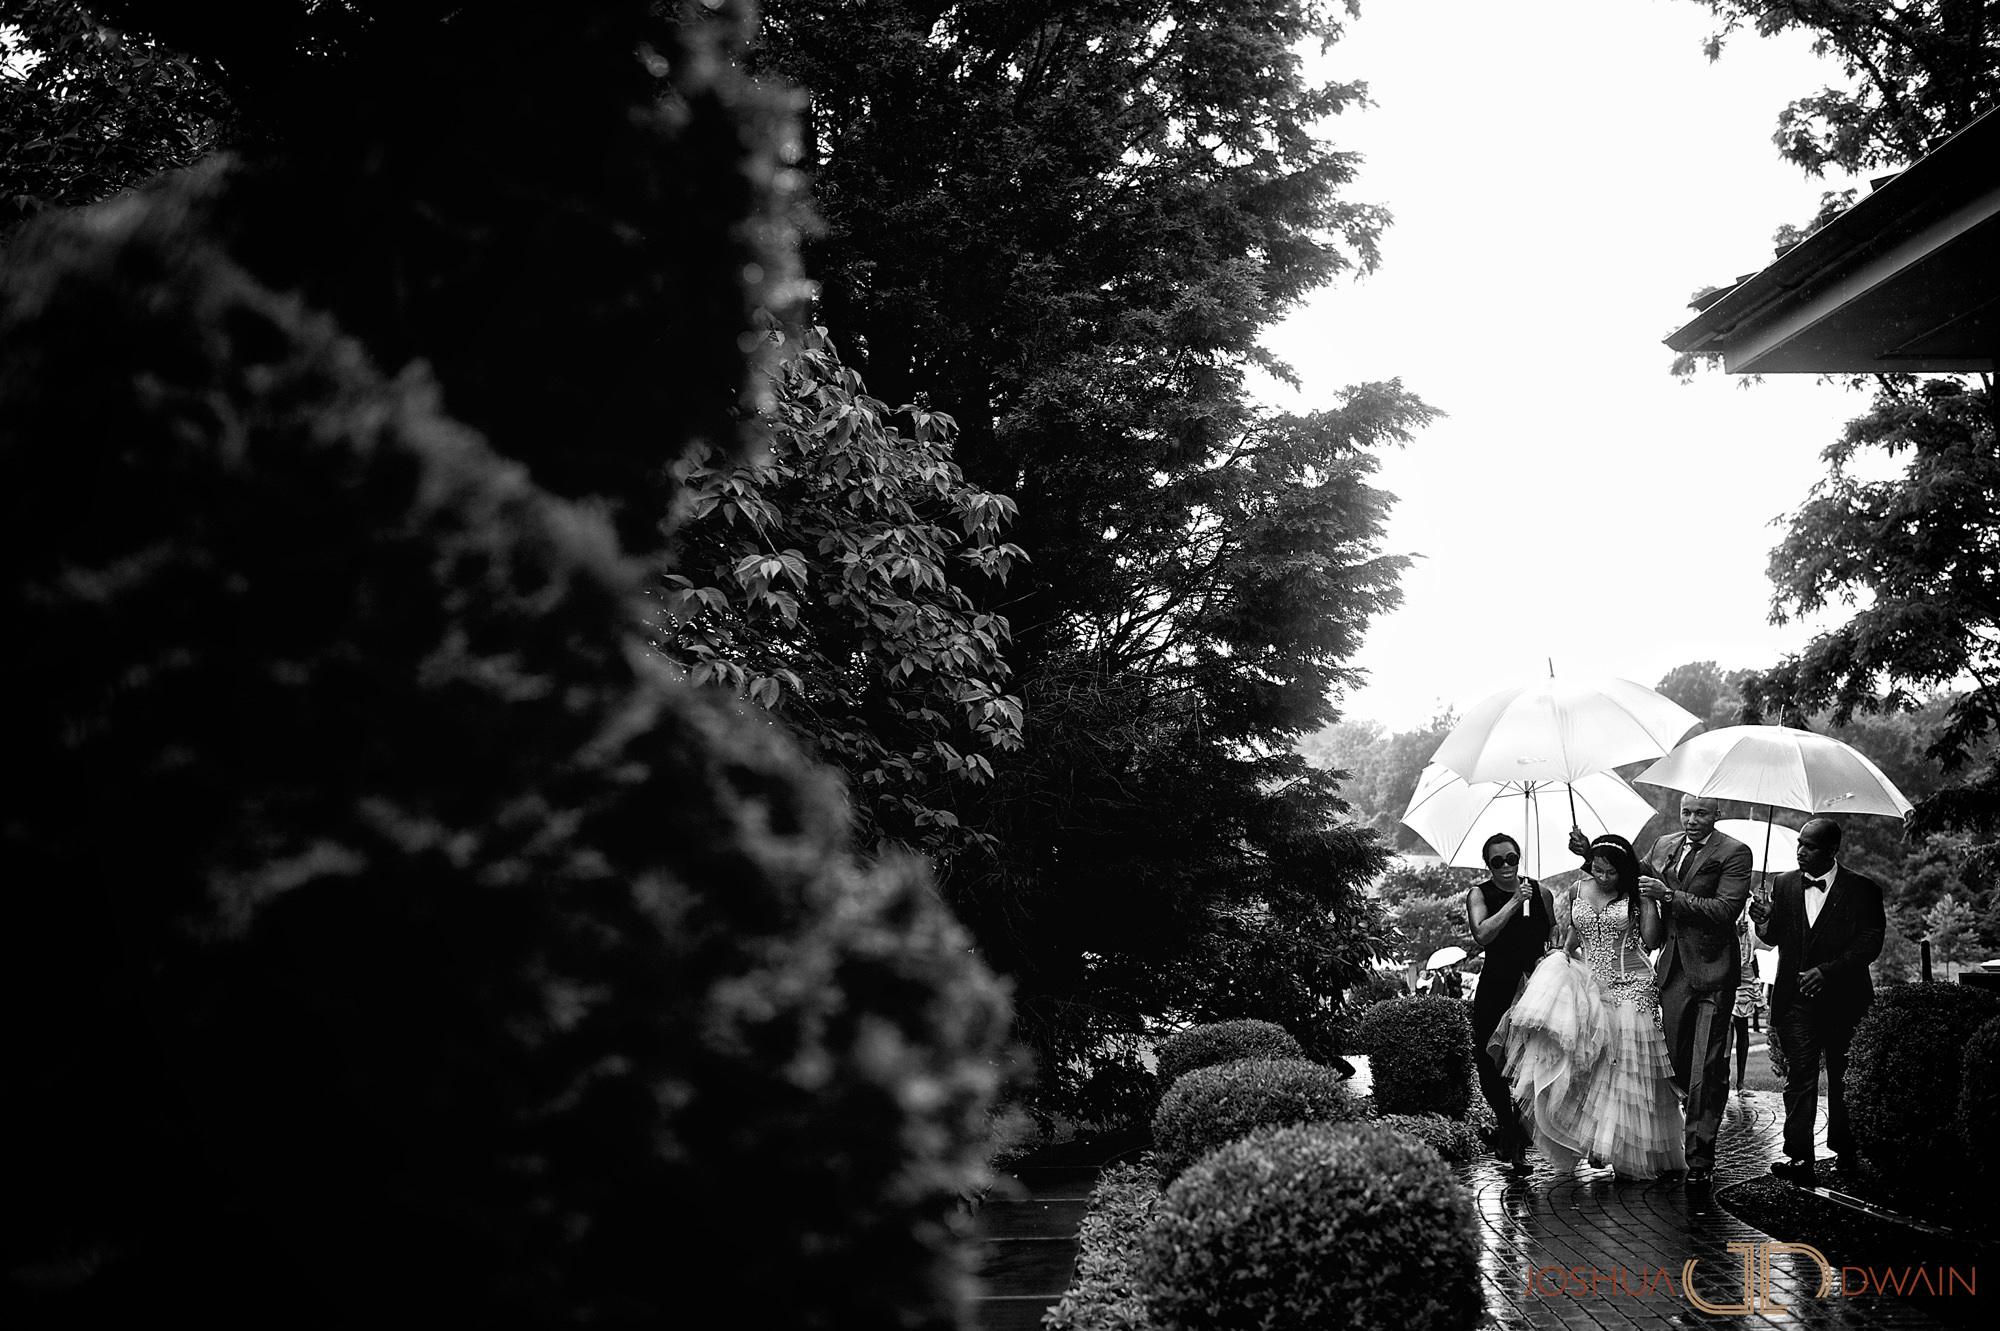 cadisha-antoine-011-ashford-estates-allentown-nj-wedding-photographer-joshua-dwain-photography-